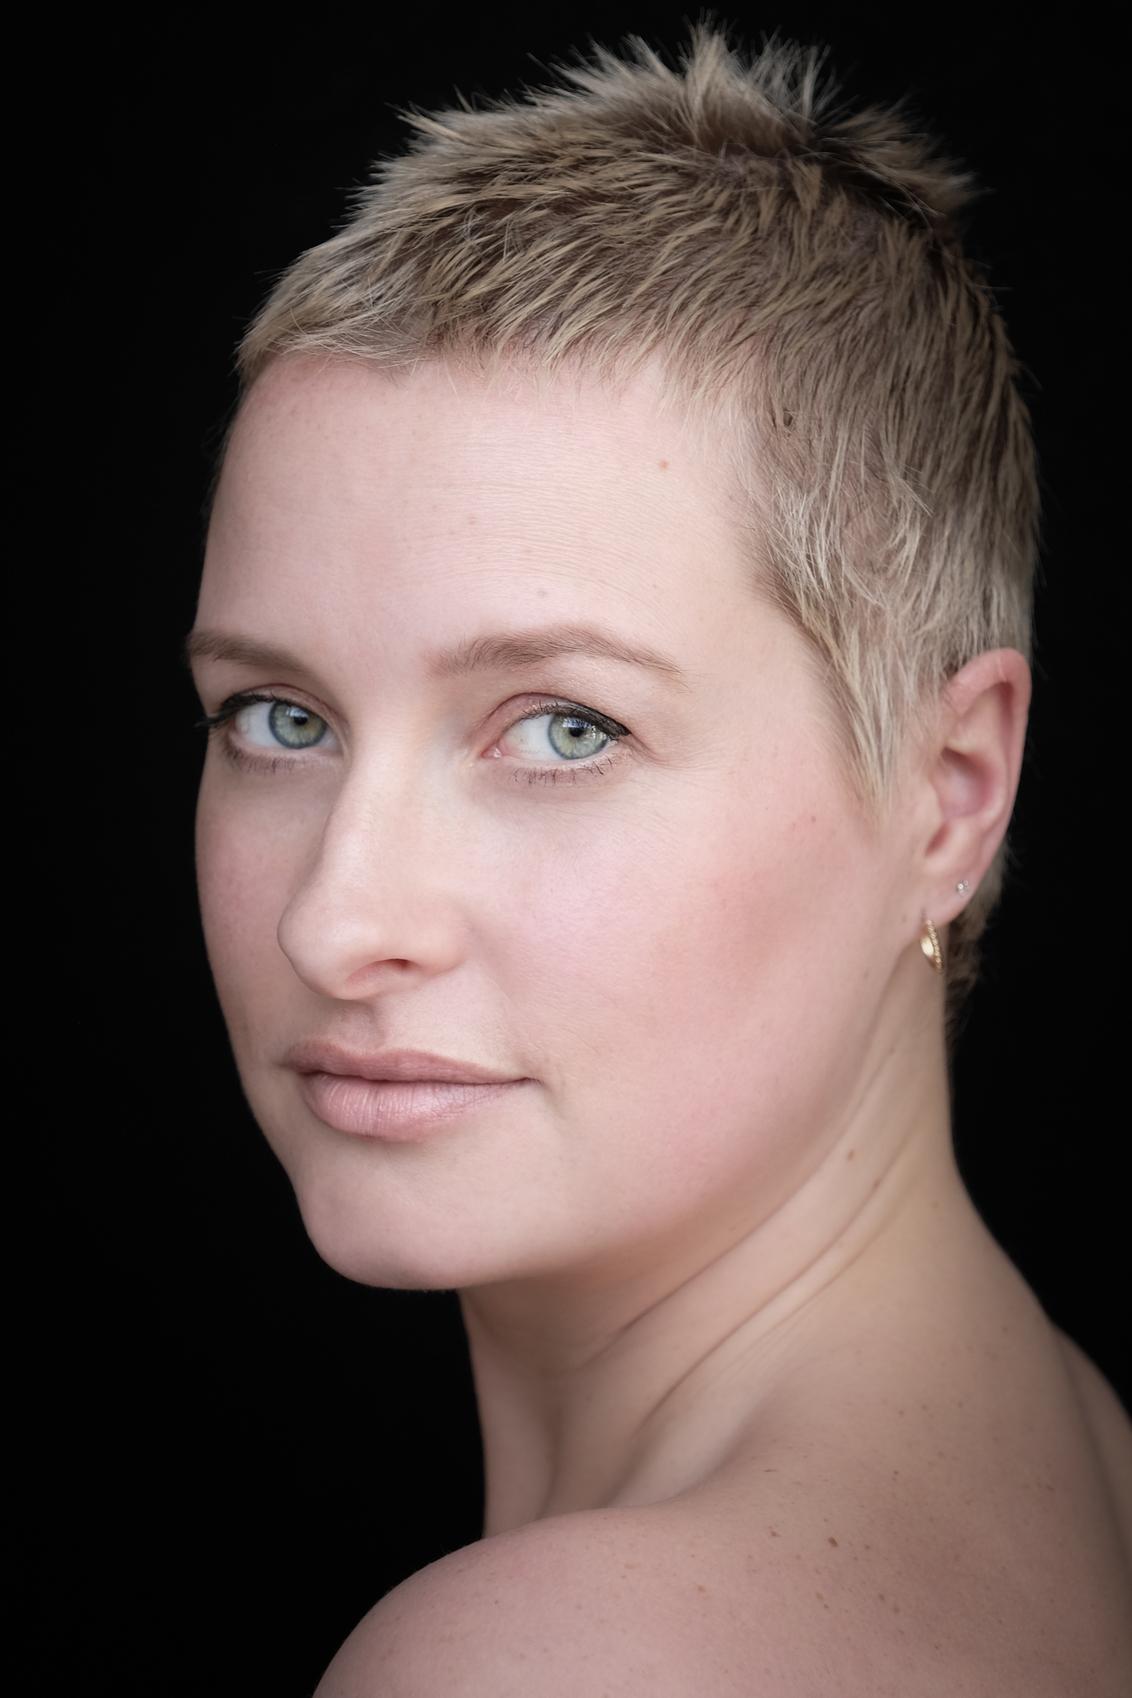 Jill! - Jill in natuurlijk licht - foto door DvdH op 26-02-2021 - deze foto bevat: vrouw, donker, licht, portret, model, liefde, daglicht, ogen, haar, lief, beauty, blond, photoshop, closeup, fotoshoot, lowkey, 50mm